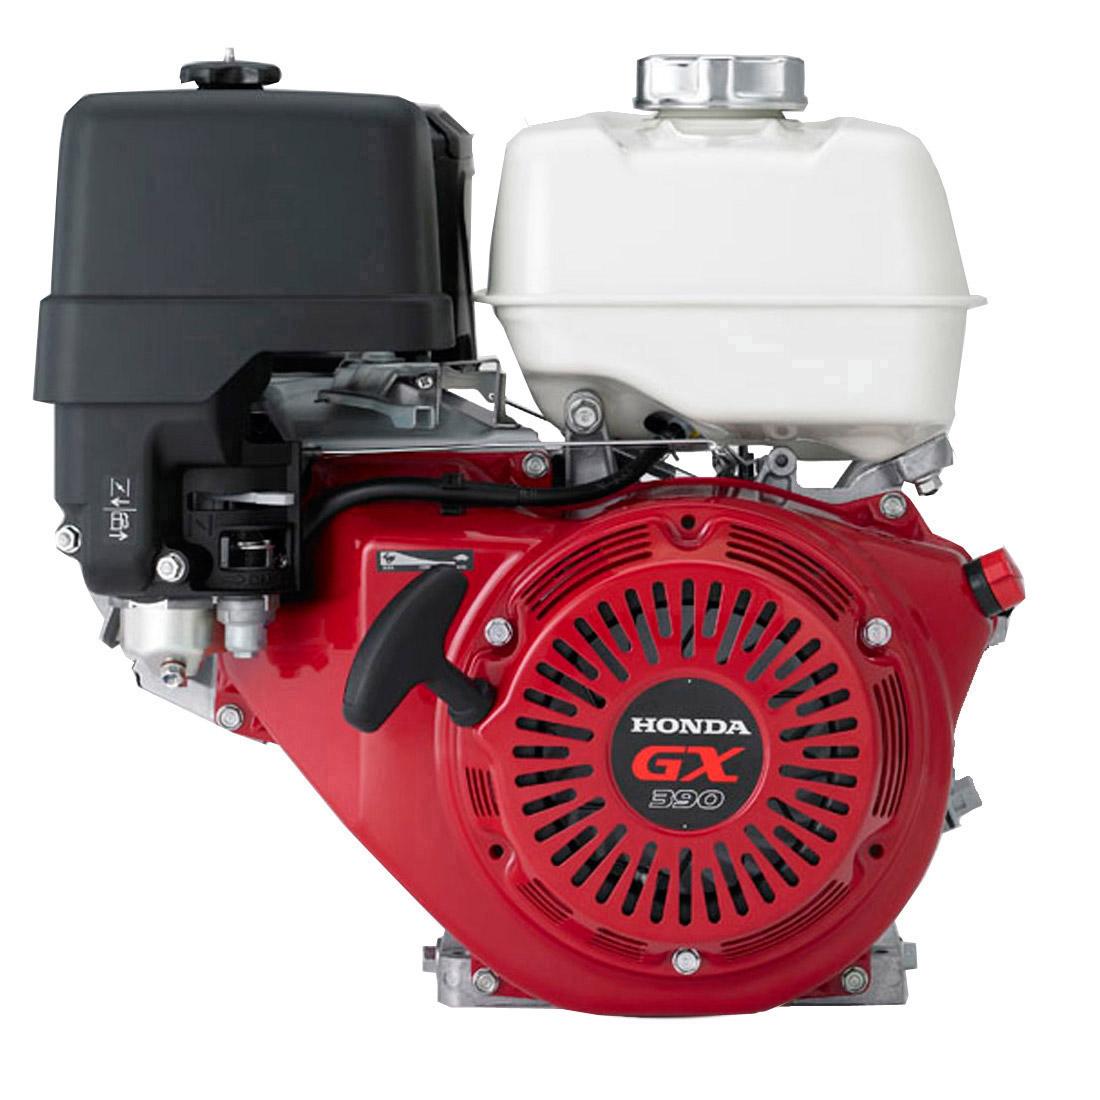 honda, honda engines, honda gx390, honda replacement parts, honda aftermarket parts